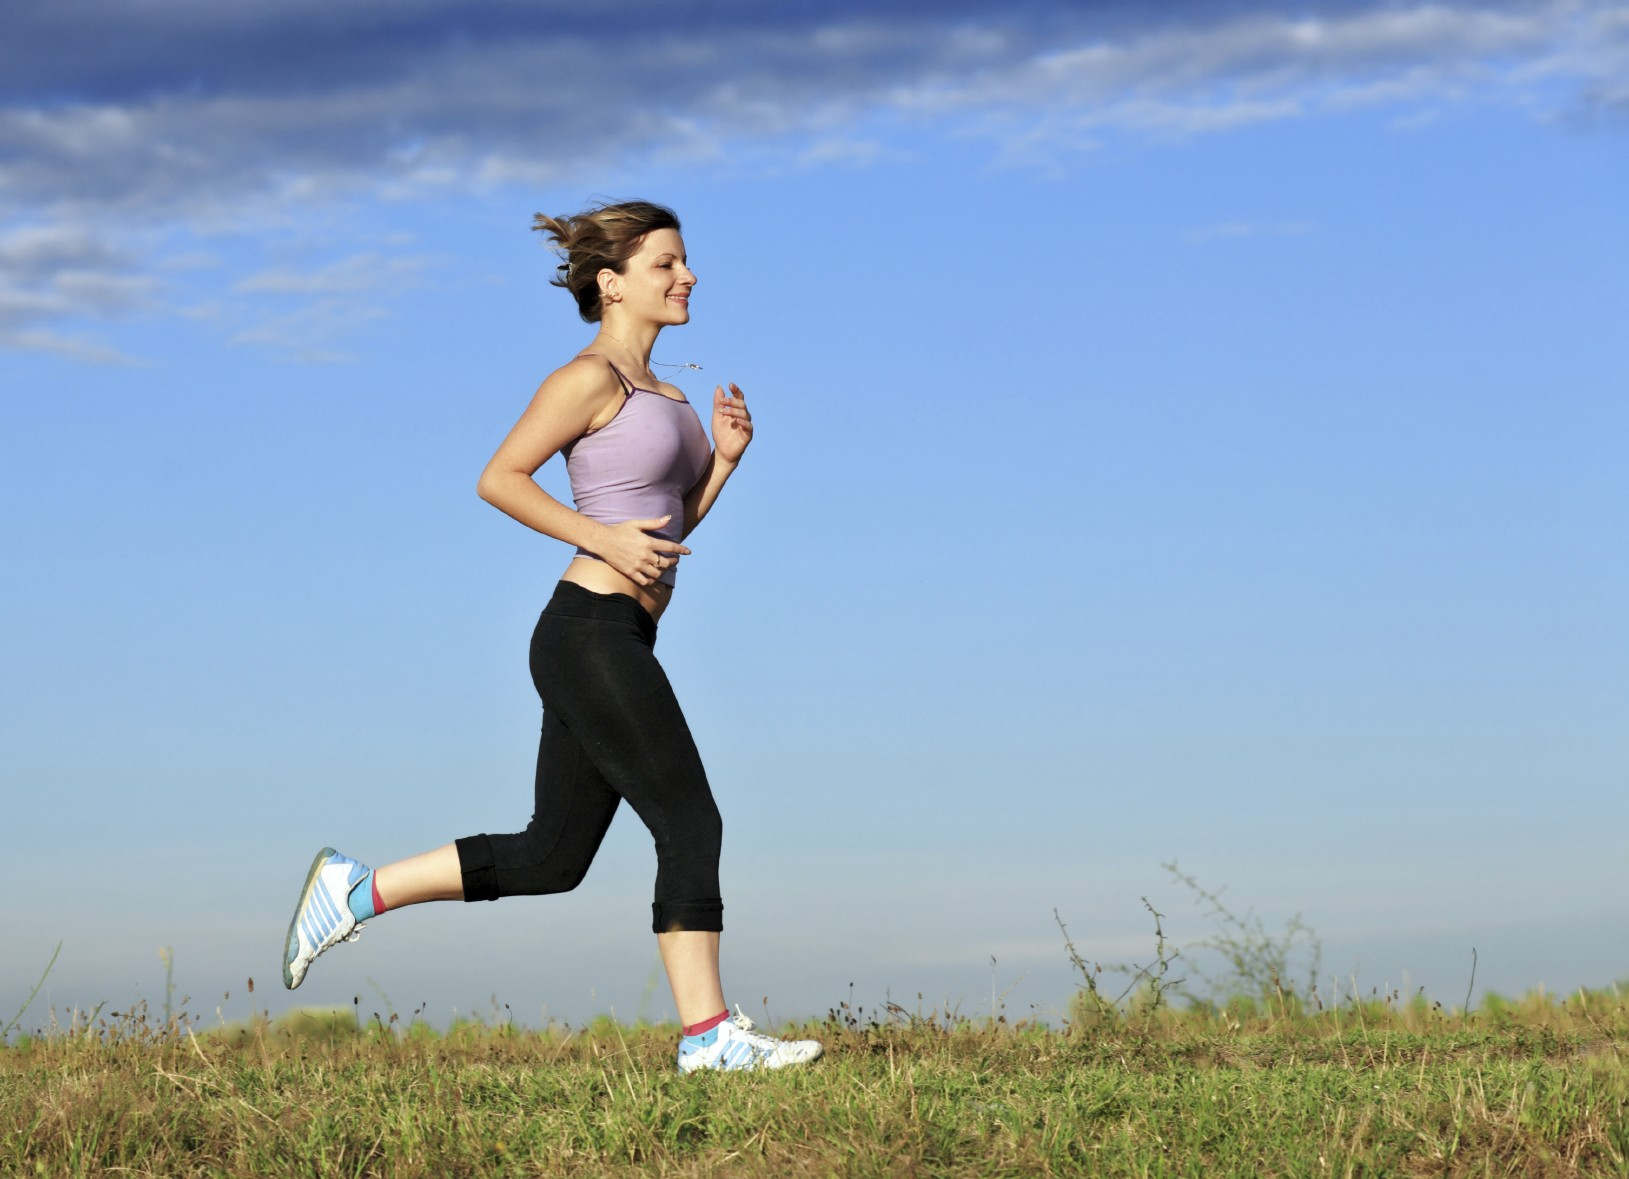 magas vérnyomás kocogás magas vérnyomás kezelése enap